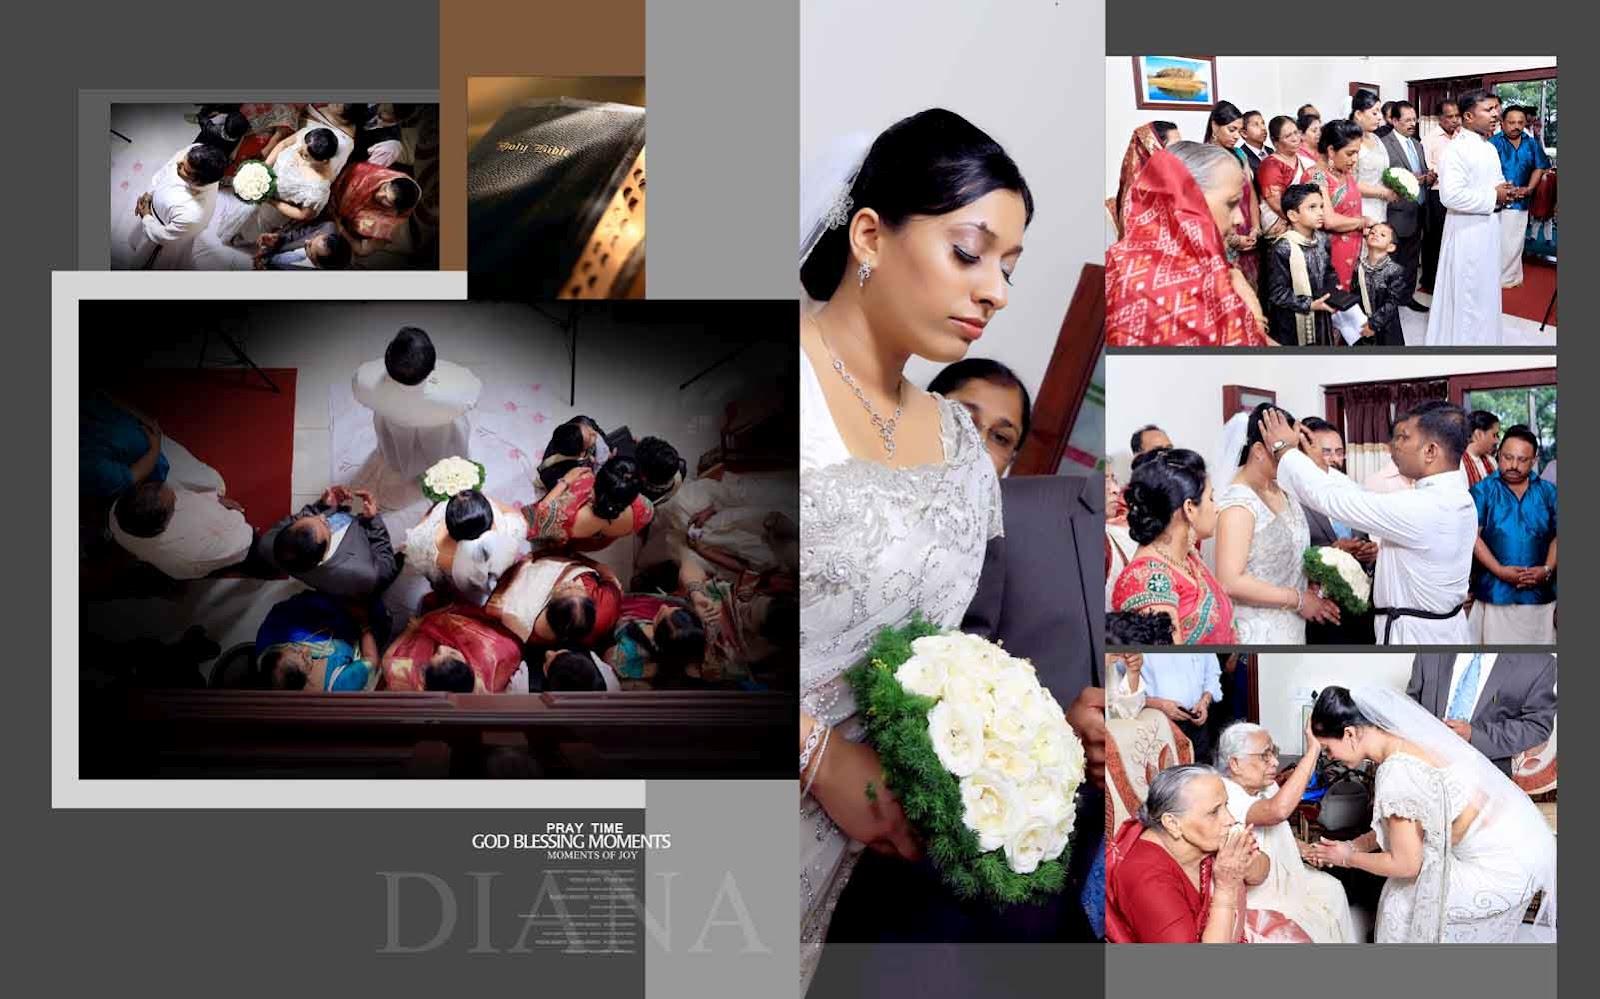 3rdeyedesigns 3rd eye designs designs kerala wedding kerala